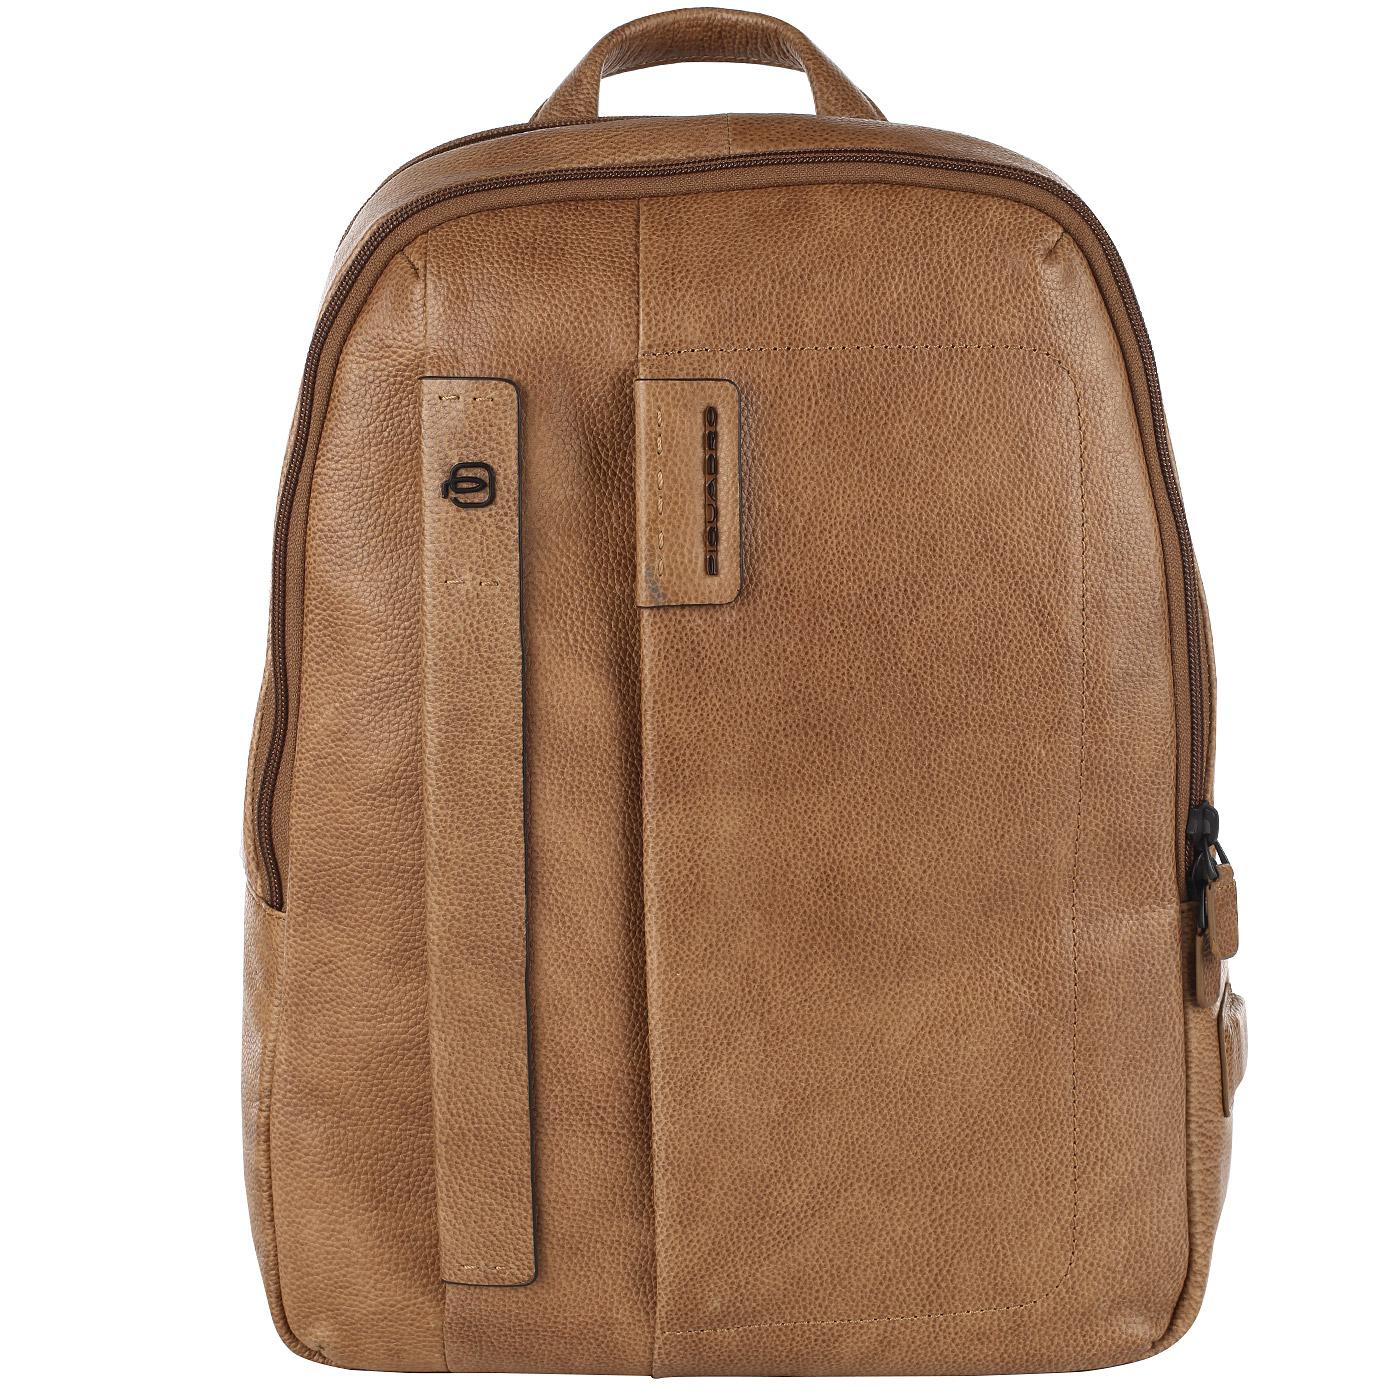 7afc2c2f3e6e Кожаный рюкзак с отделением для ноутбука Piquadro Plus CA3869P15S/CU ...